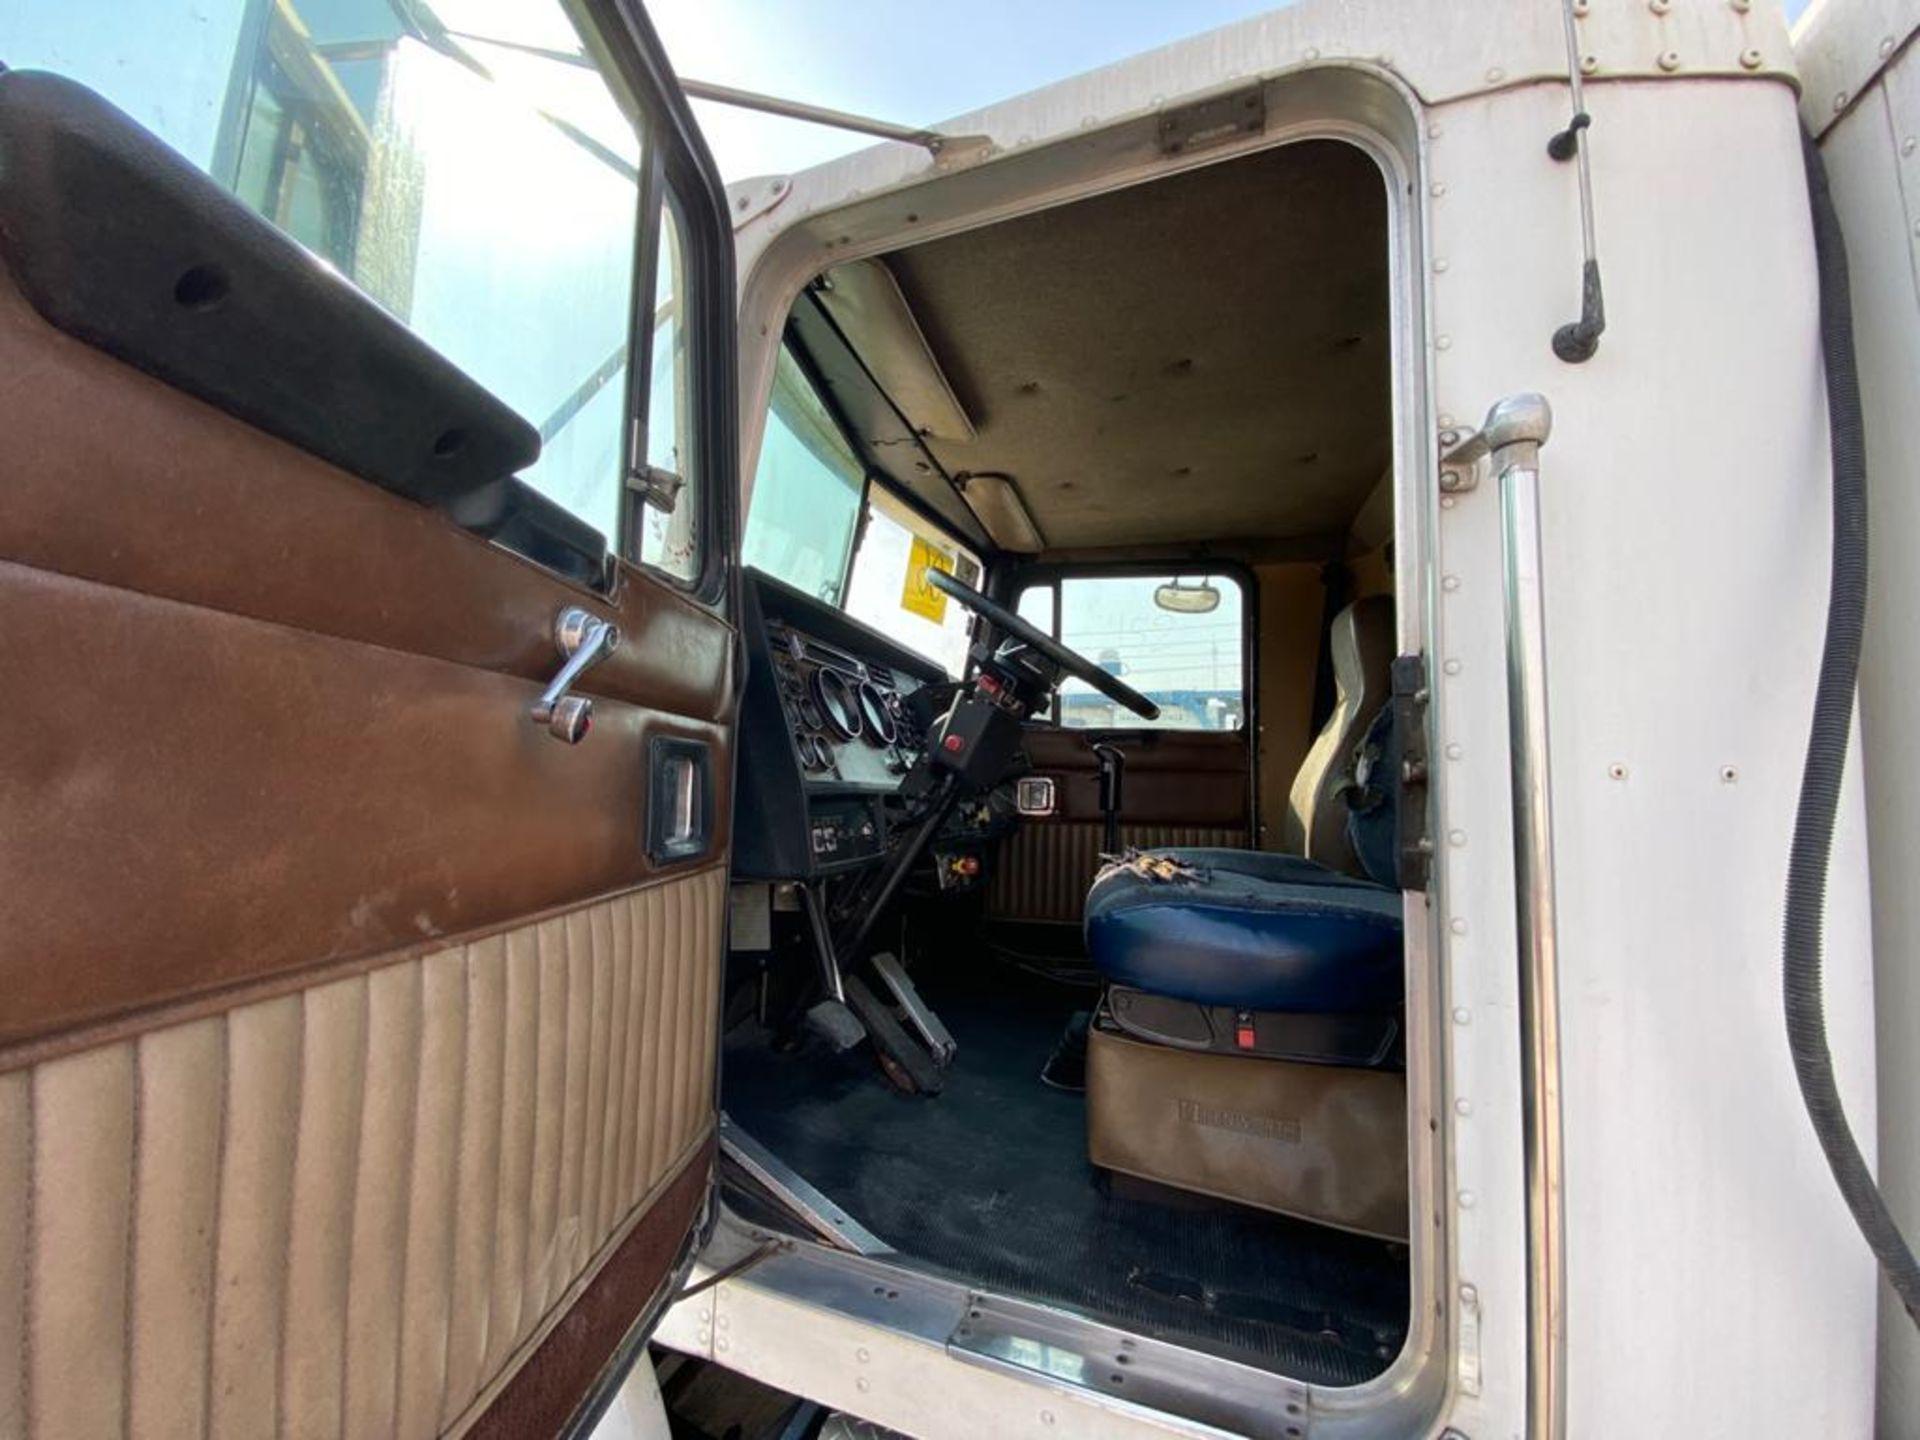 1998 Kenworth Sleeper truck tractor, standard transmission of 18 speeds - Image 29 of 75